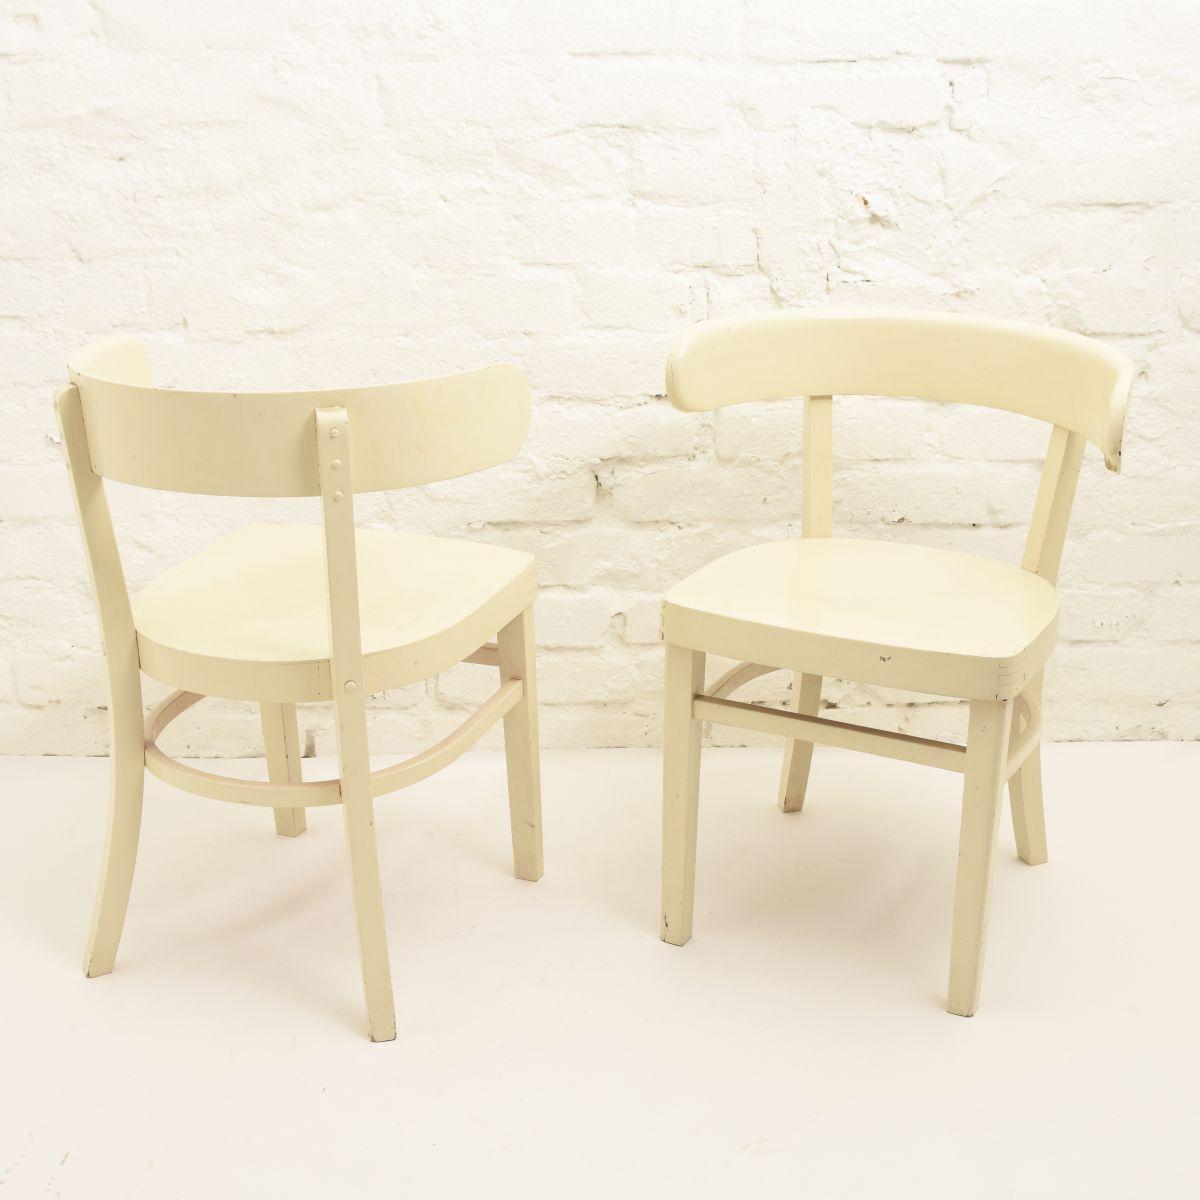 West-Werner-Hugging-Chair-White